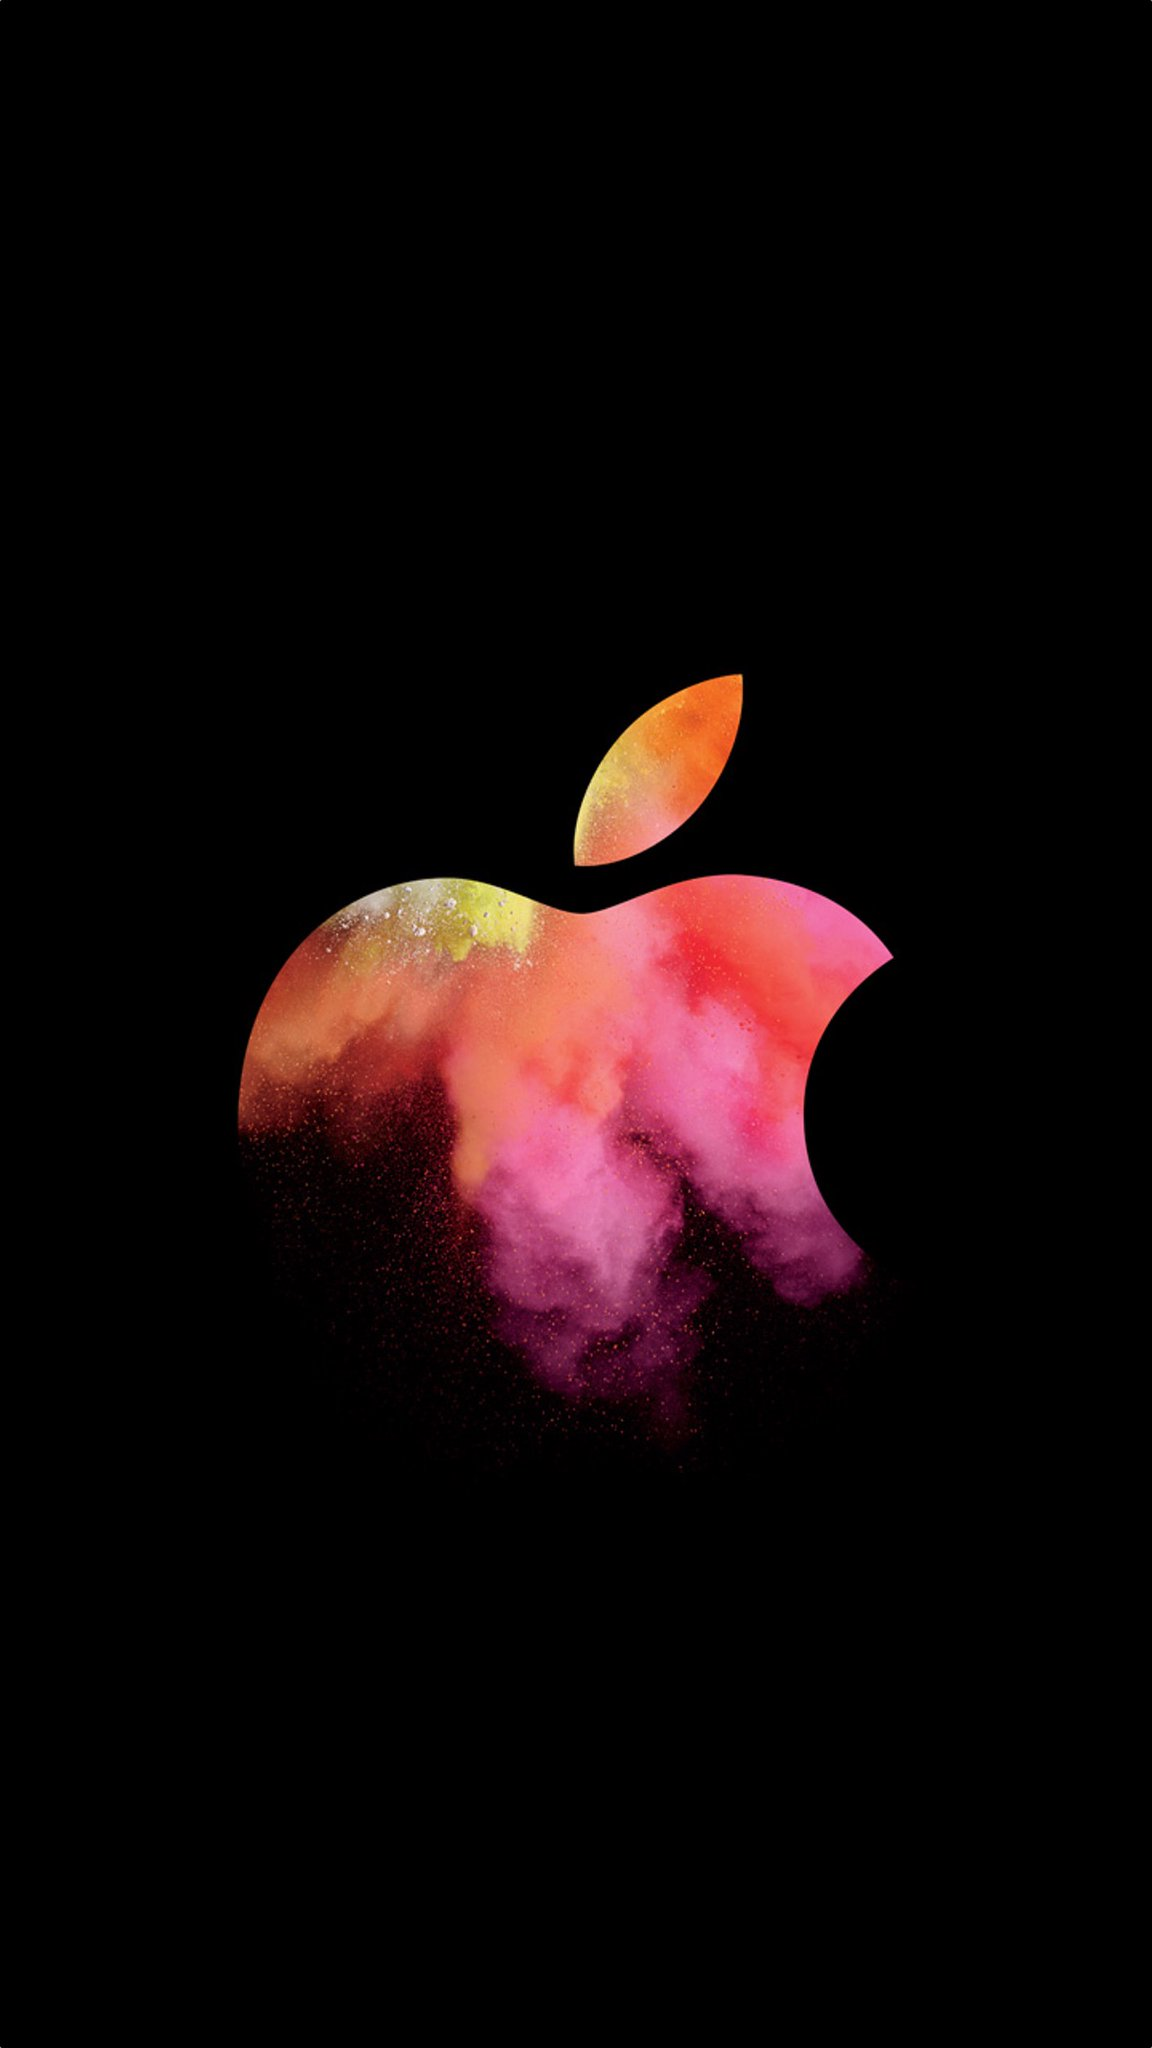 SebRaynal_Apple October 27 media event hello again